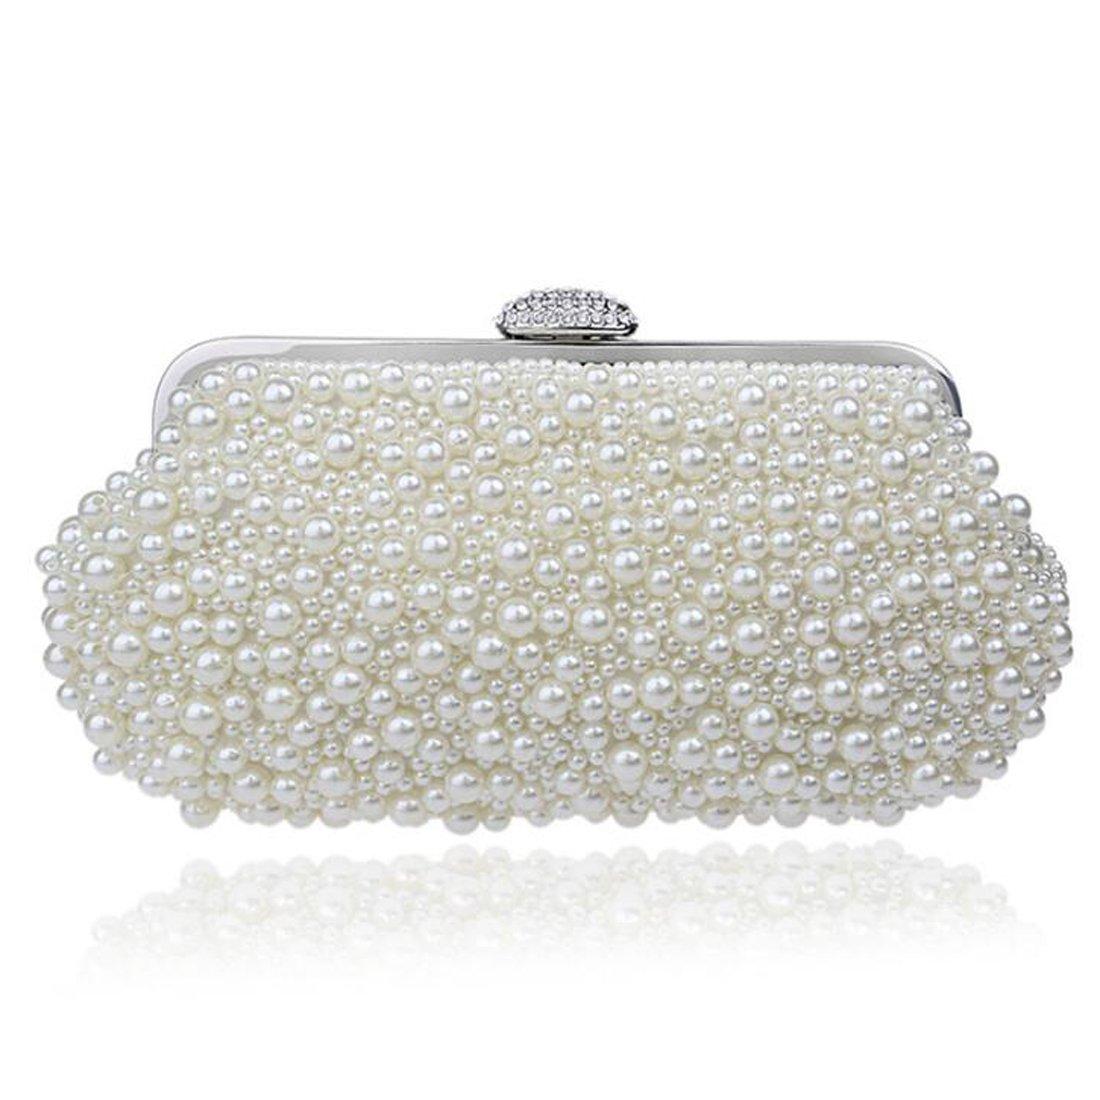 EPLAZA Women Pearl Beaded Evening Clutch Handbags Wedding Party Bags Purse (beige)